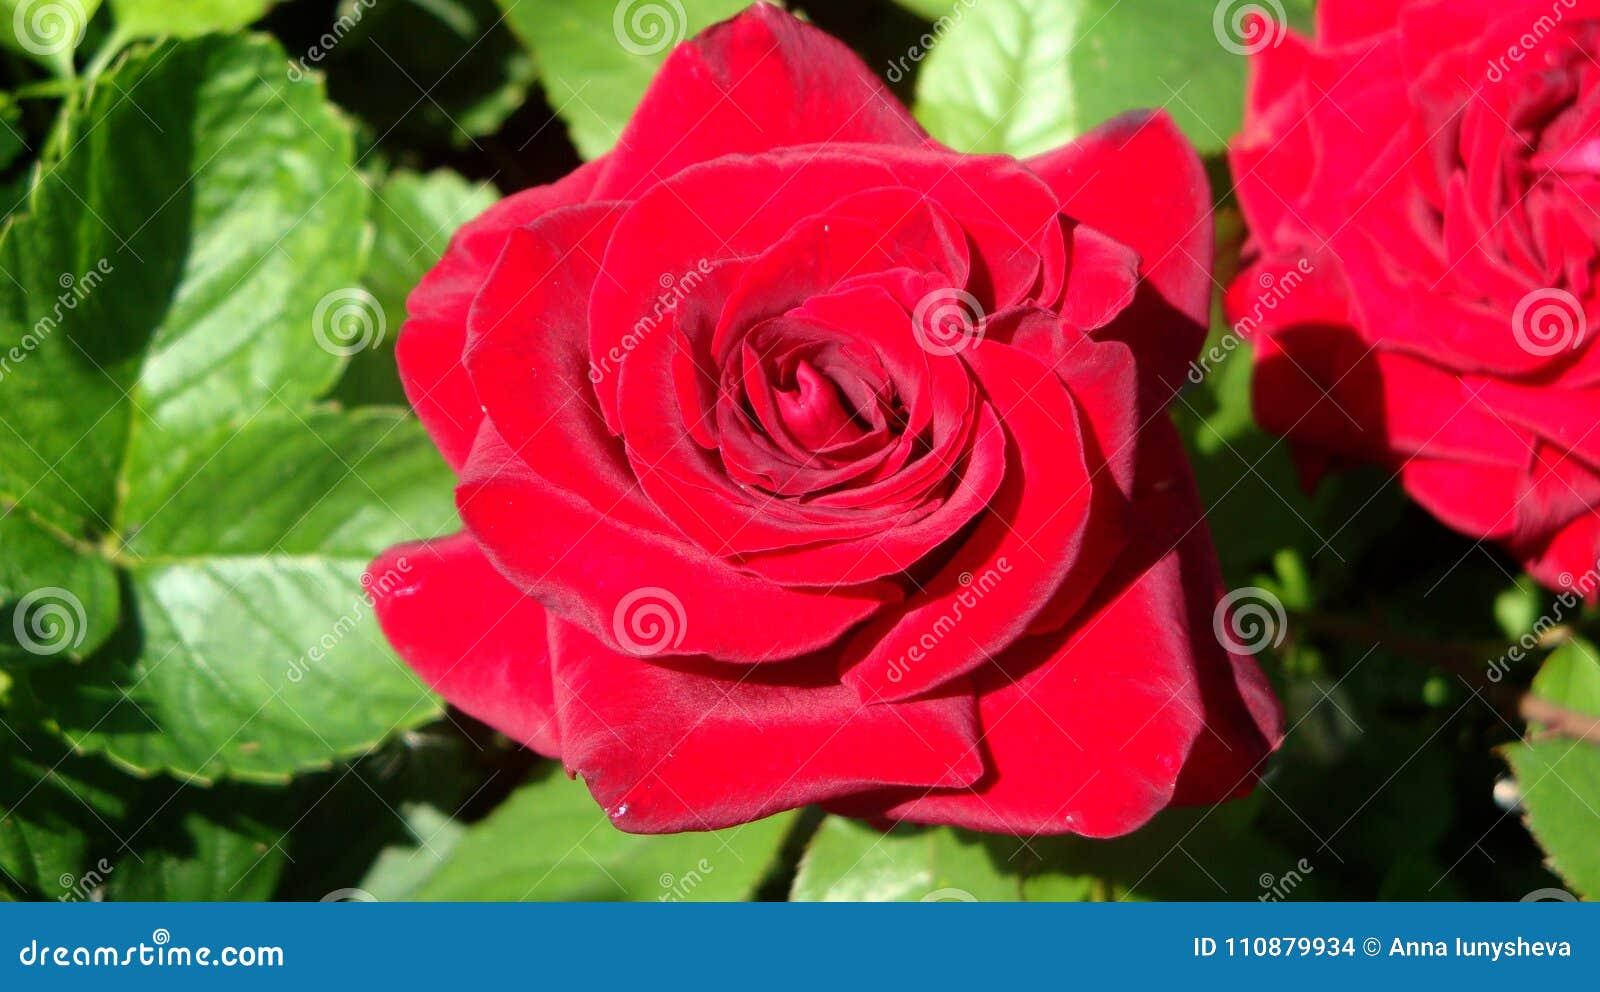 Red Roses Symbolize Love Stock Photo Image Of Brush 110879934